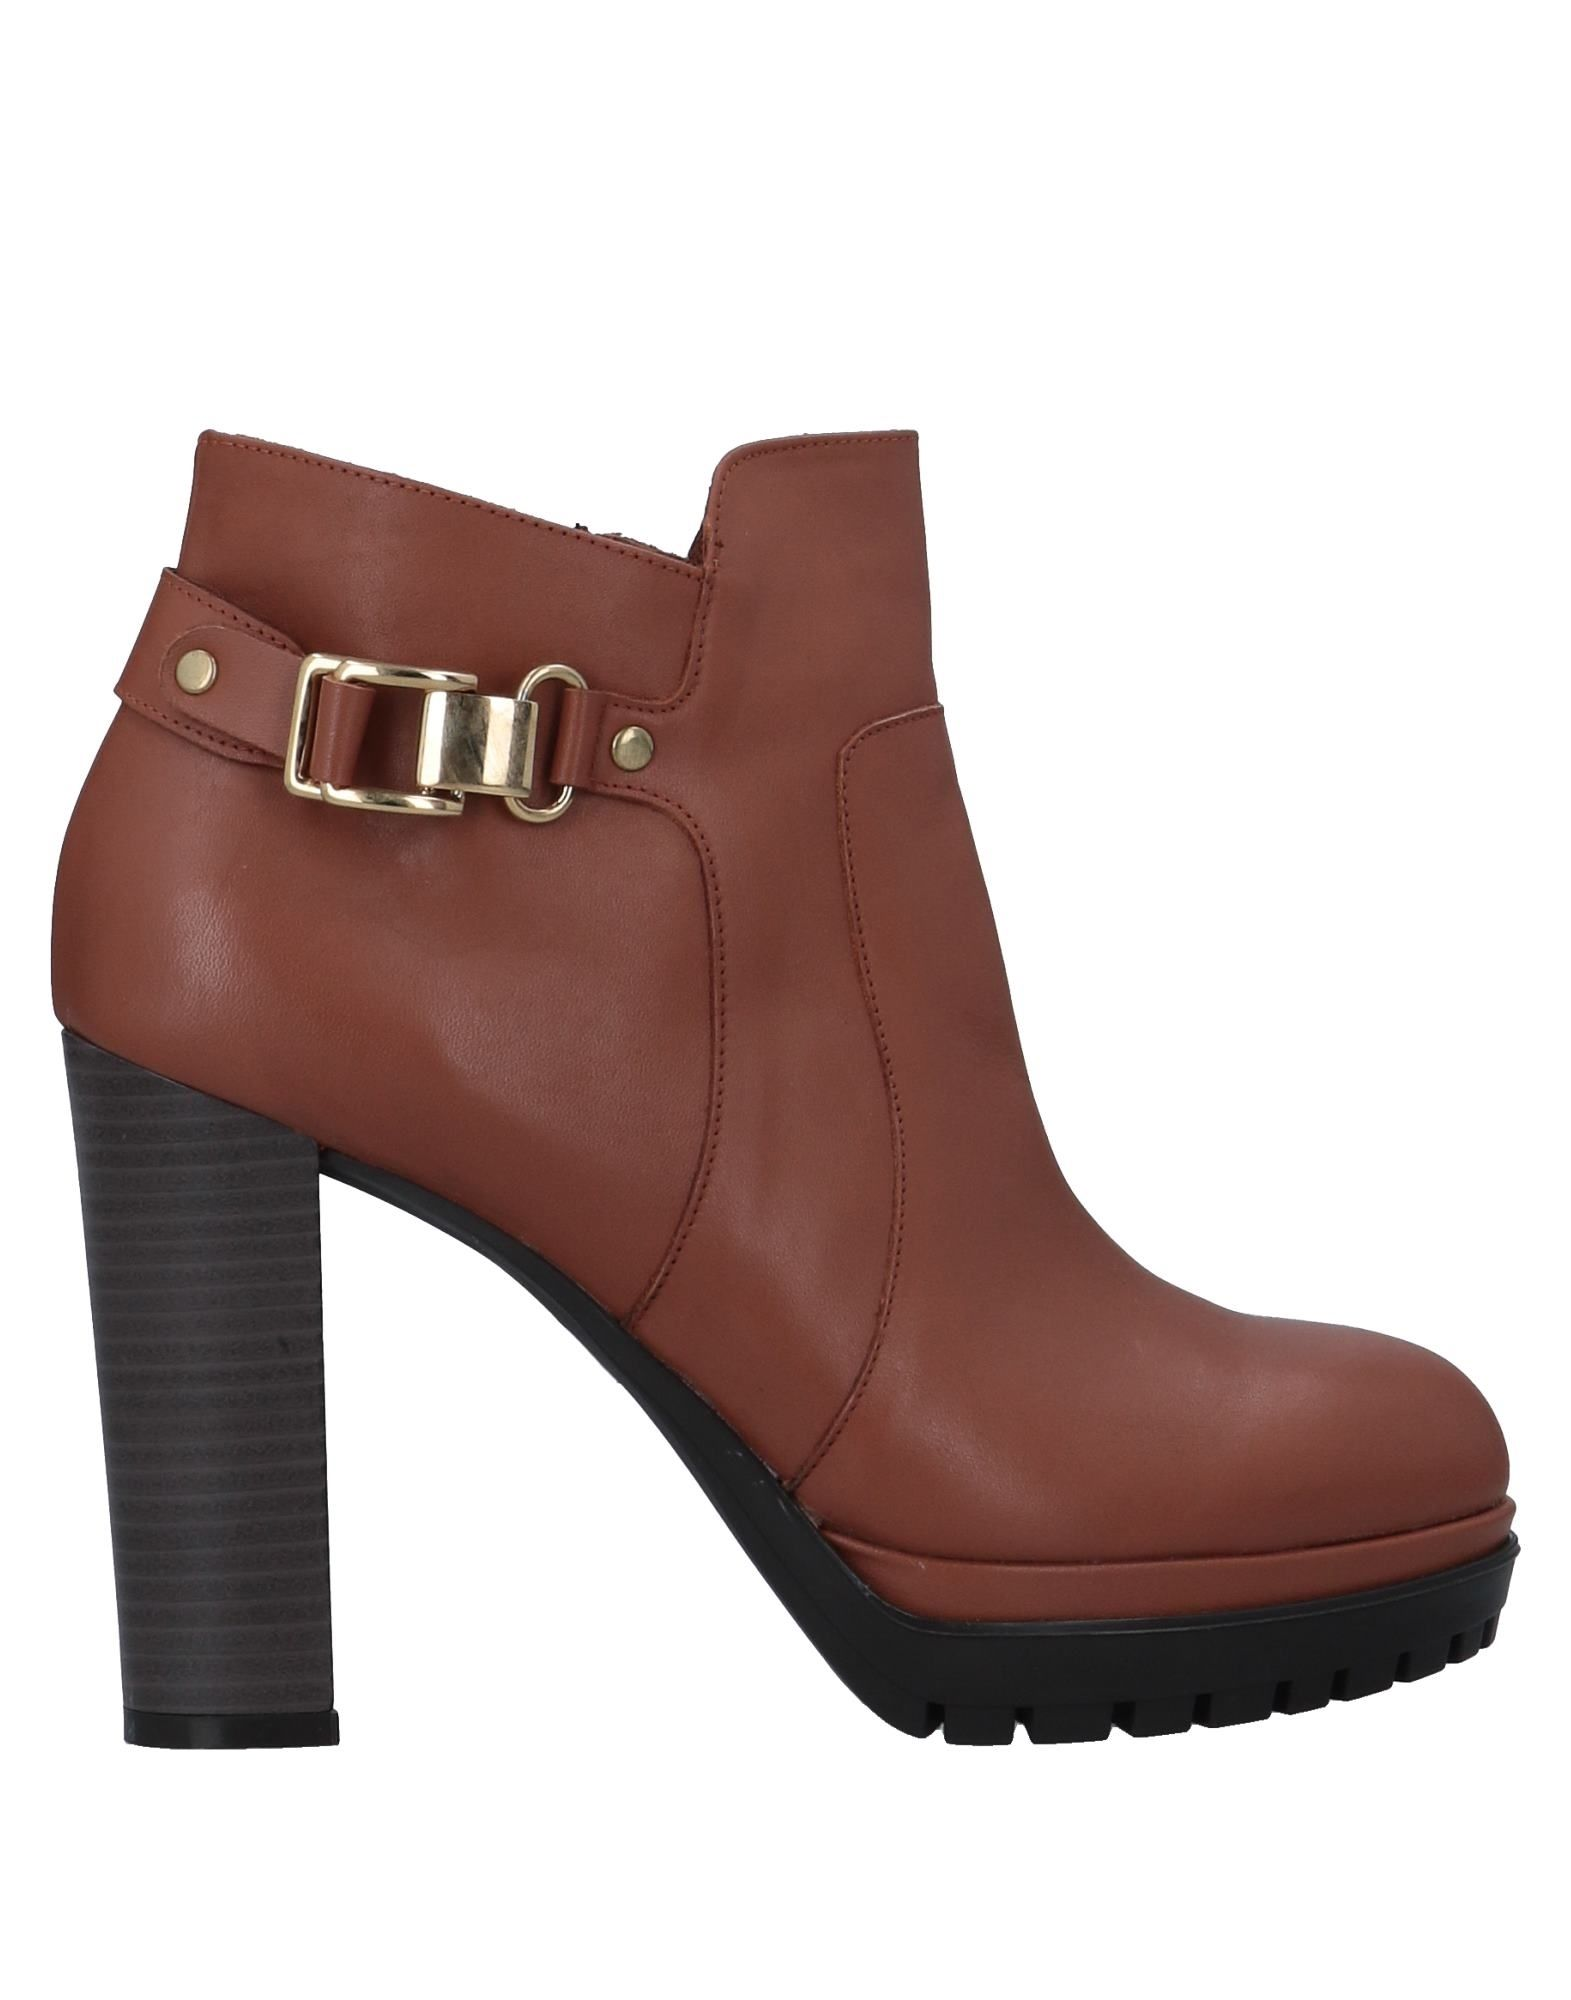 Exe' Stiefelette Damen  11534470HF Gute Qualität beliebte Schuhe